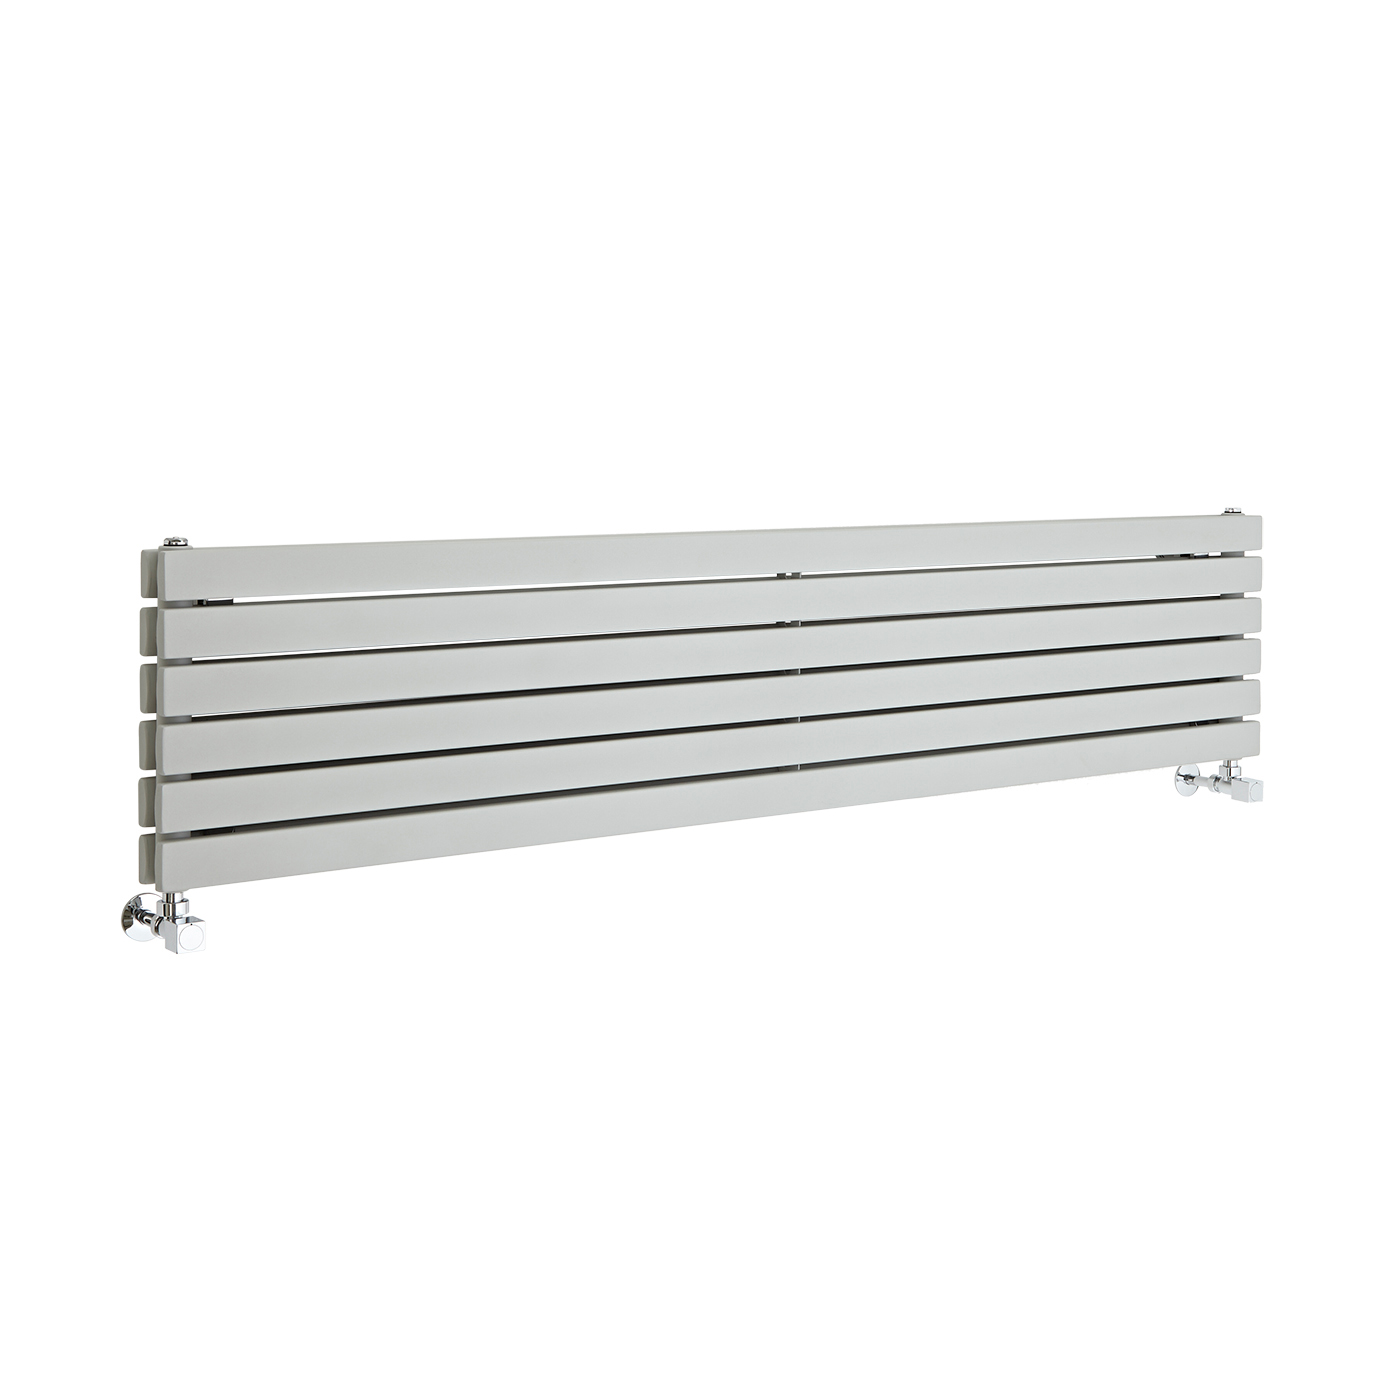 Design Heizkörper Horizontal Doppellagig Silber 354mm x 1600mm 1700W - Sloane